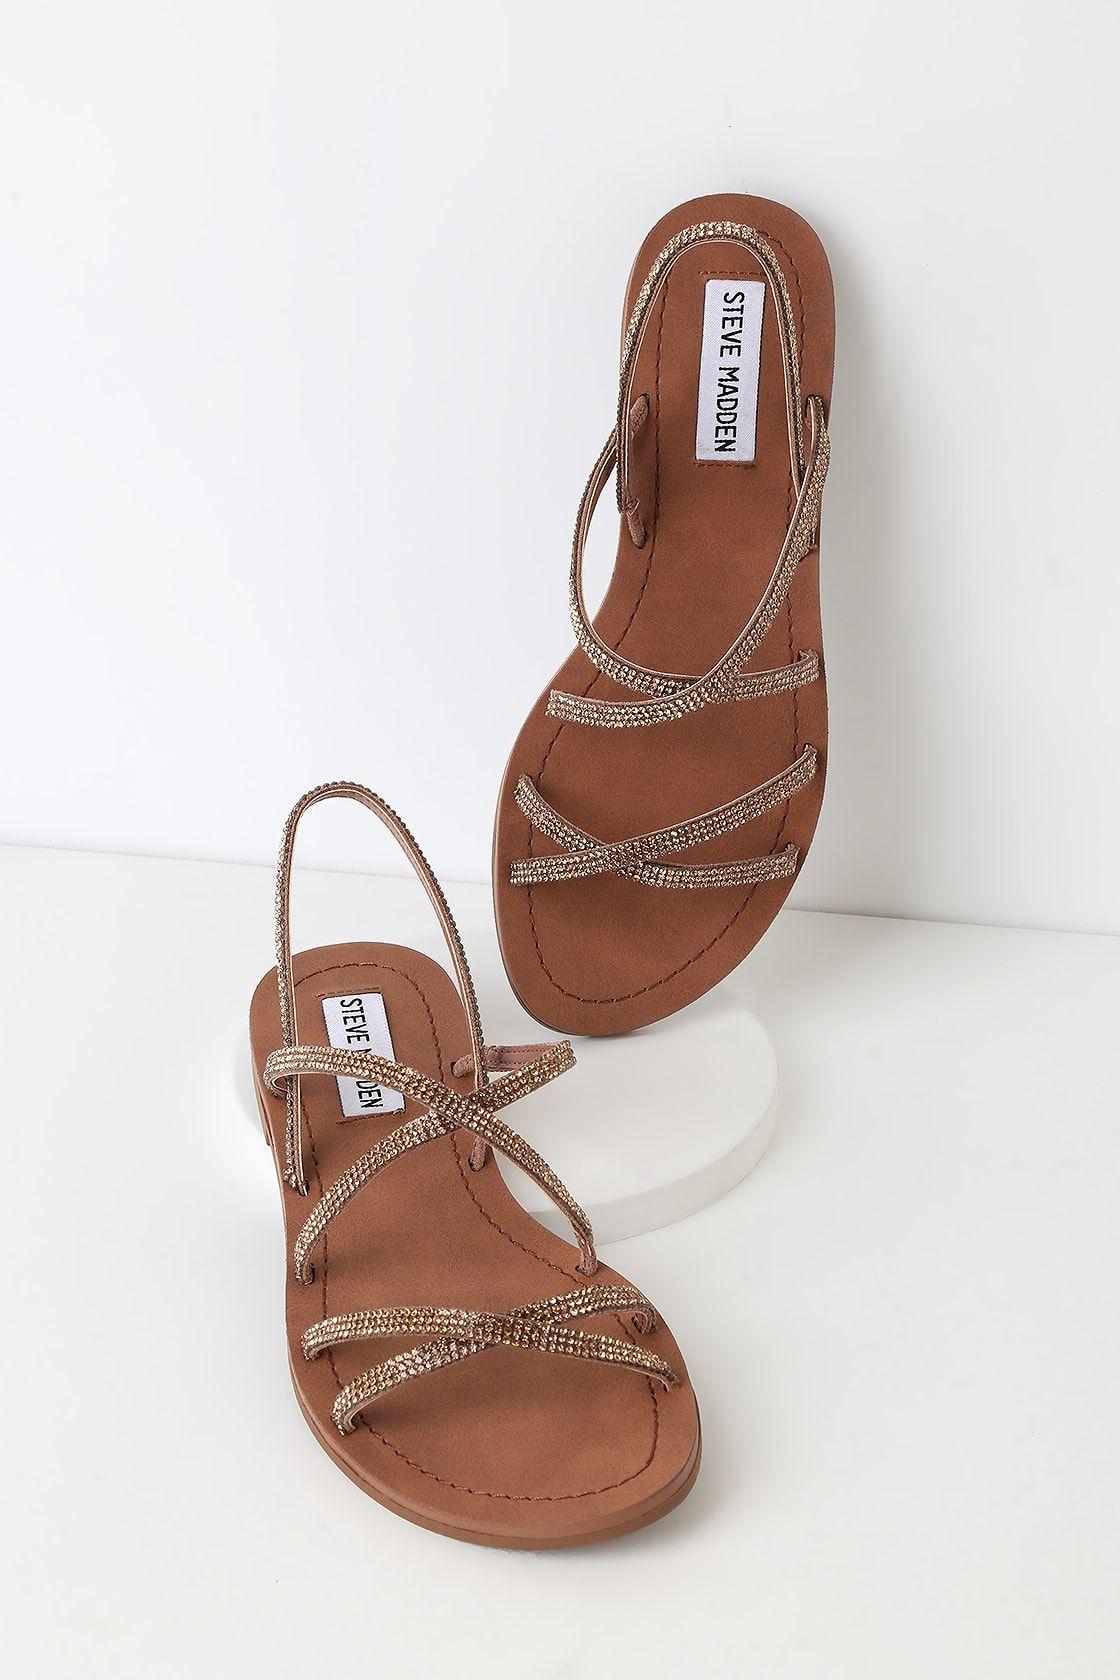 c51434dd5b7 Lulus | Rita Bronze Multi Strappy Sandal Heels | Size 9.5 | Brown ...